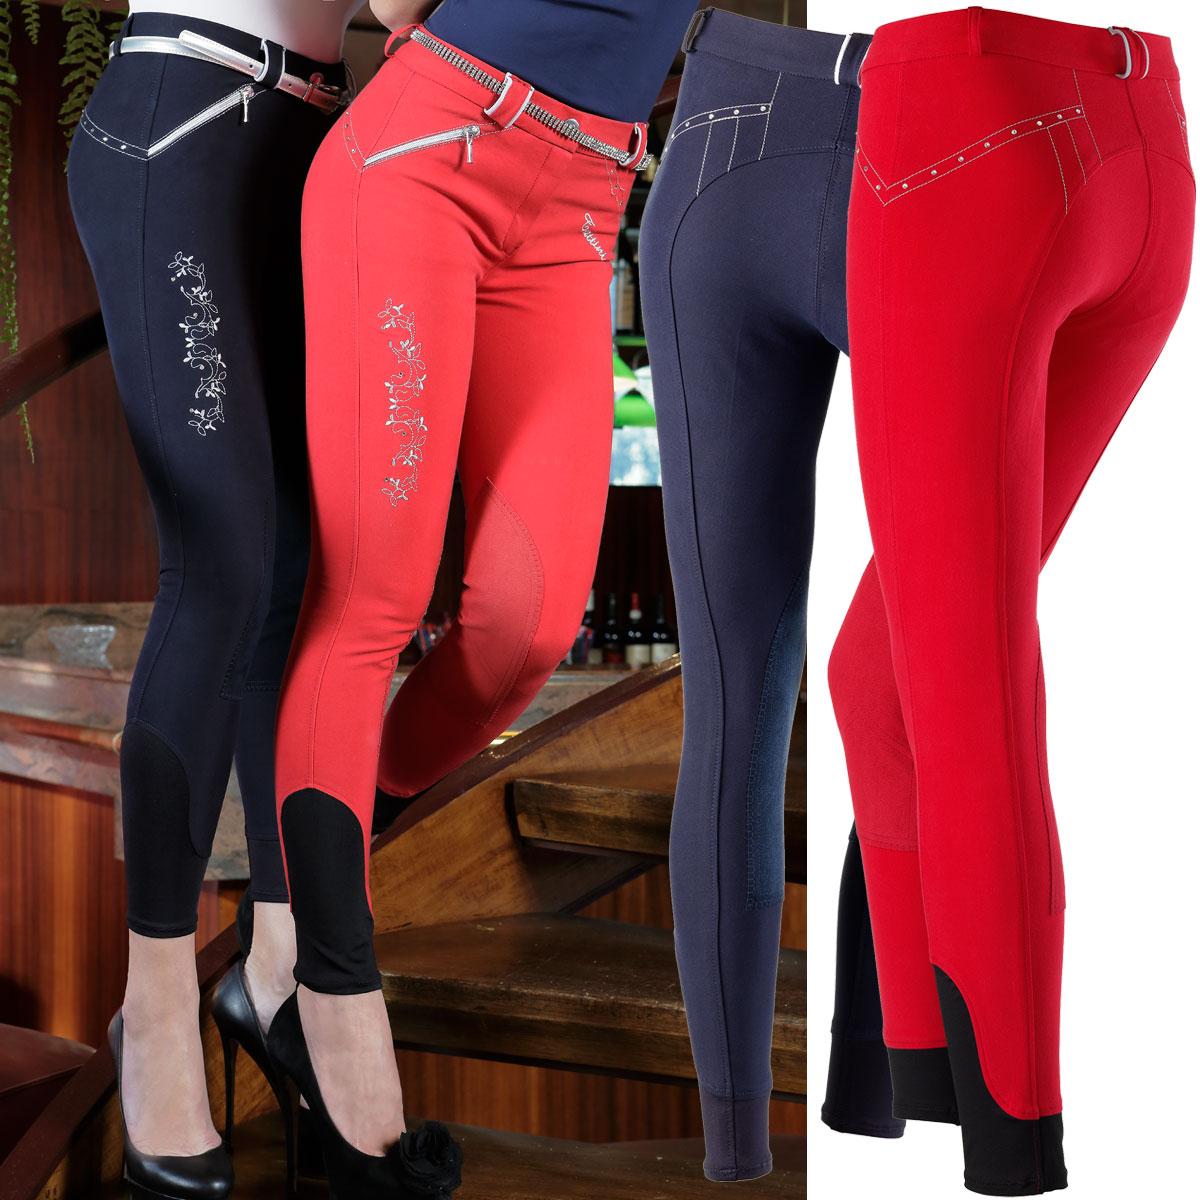 Pantaloni Decoro Con Tattini cloe Donna Lurex qxPrUqCv